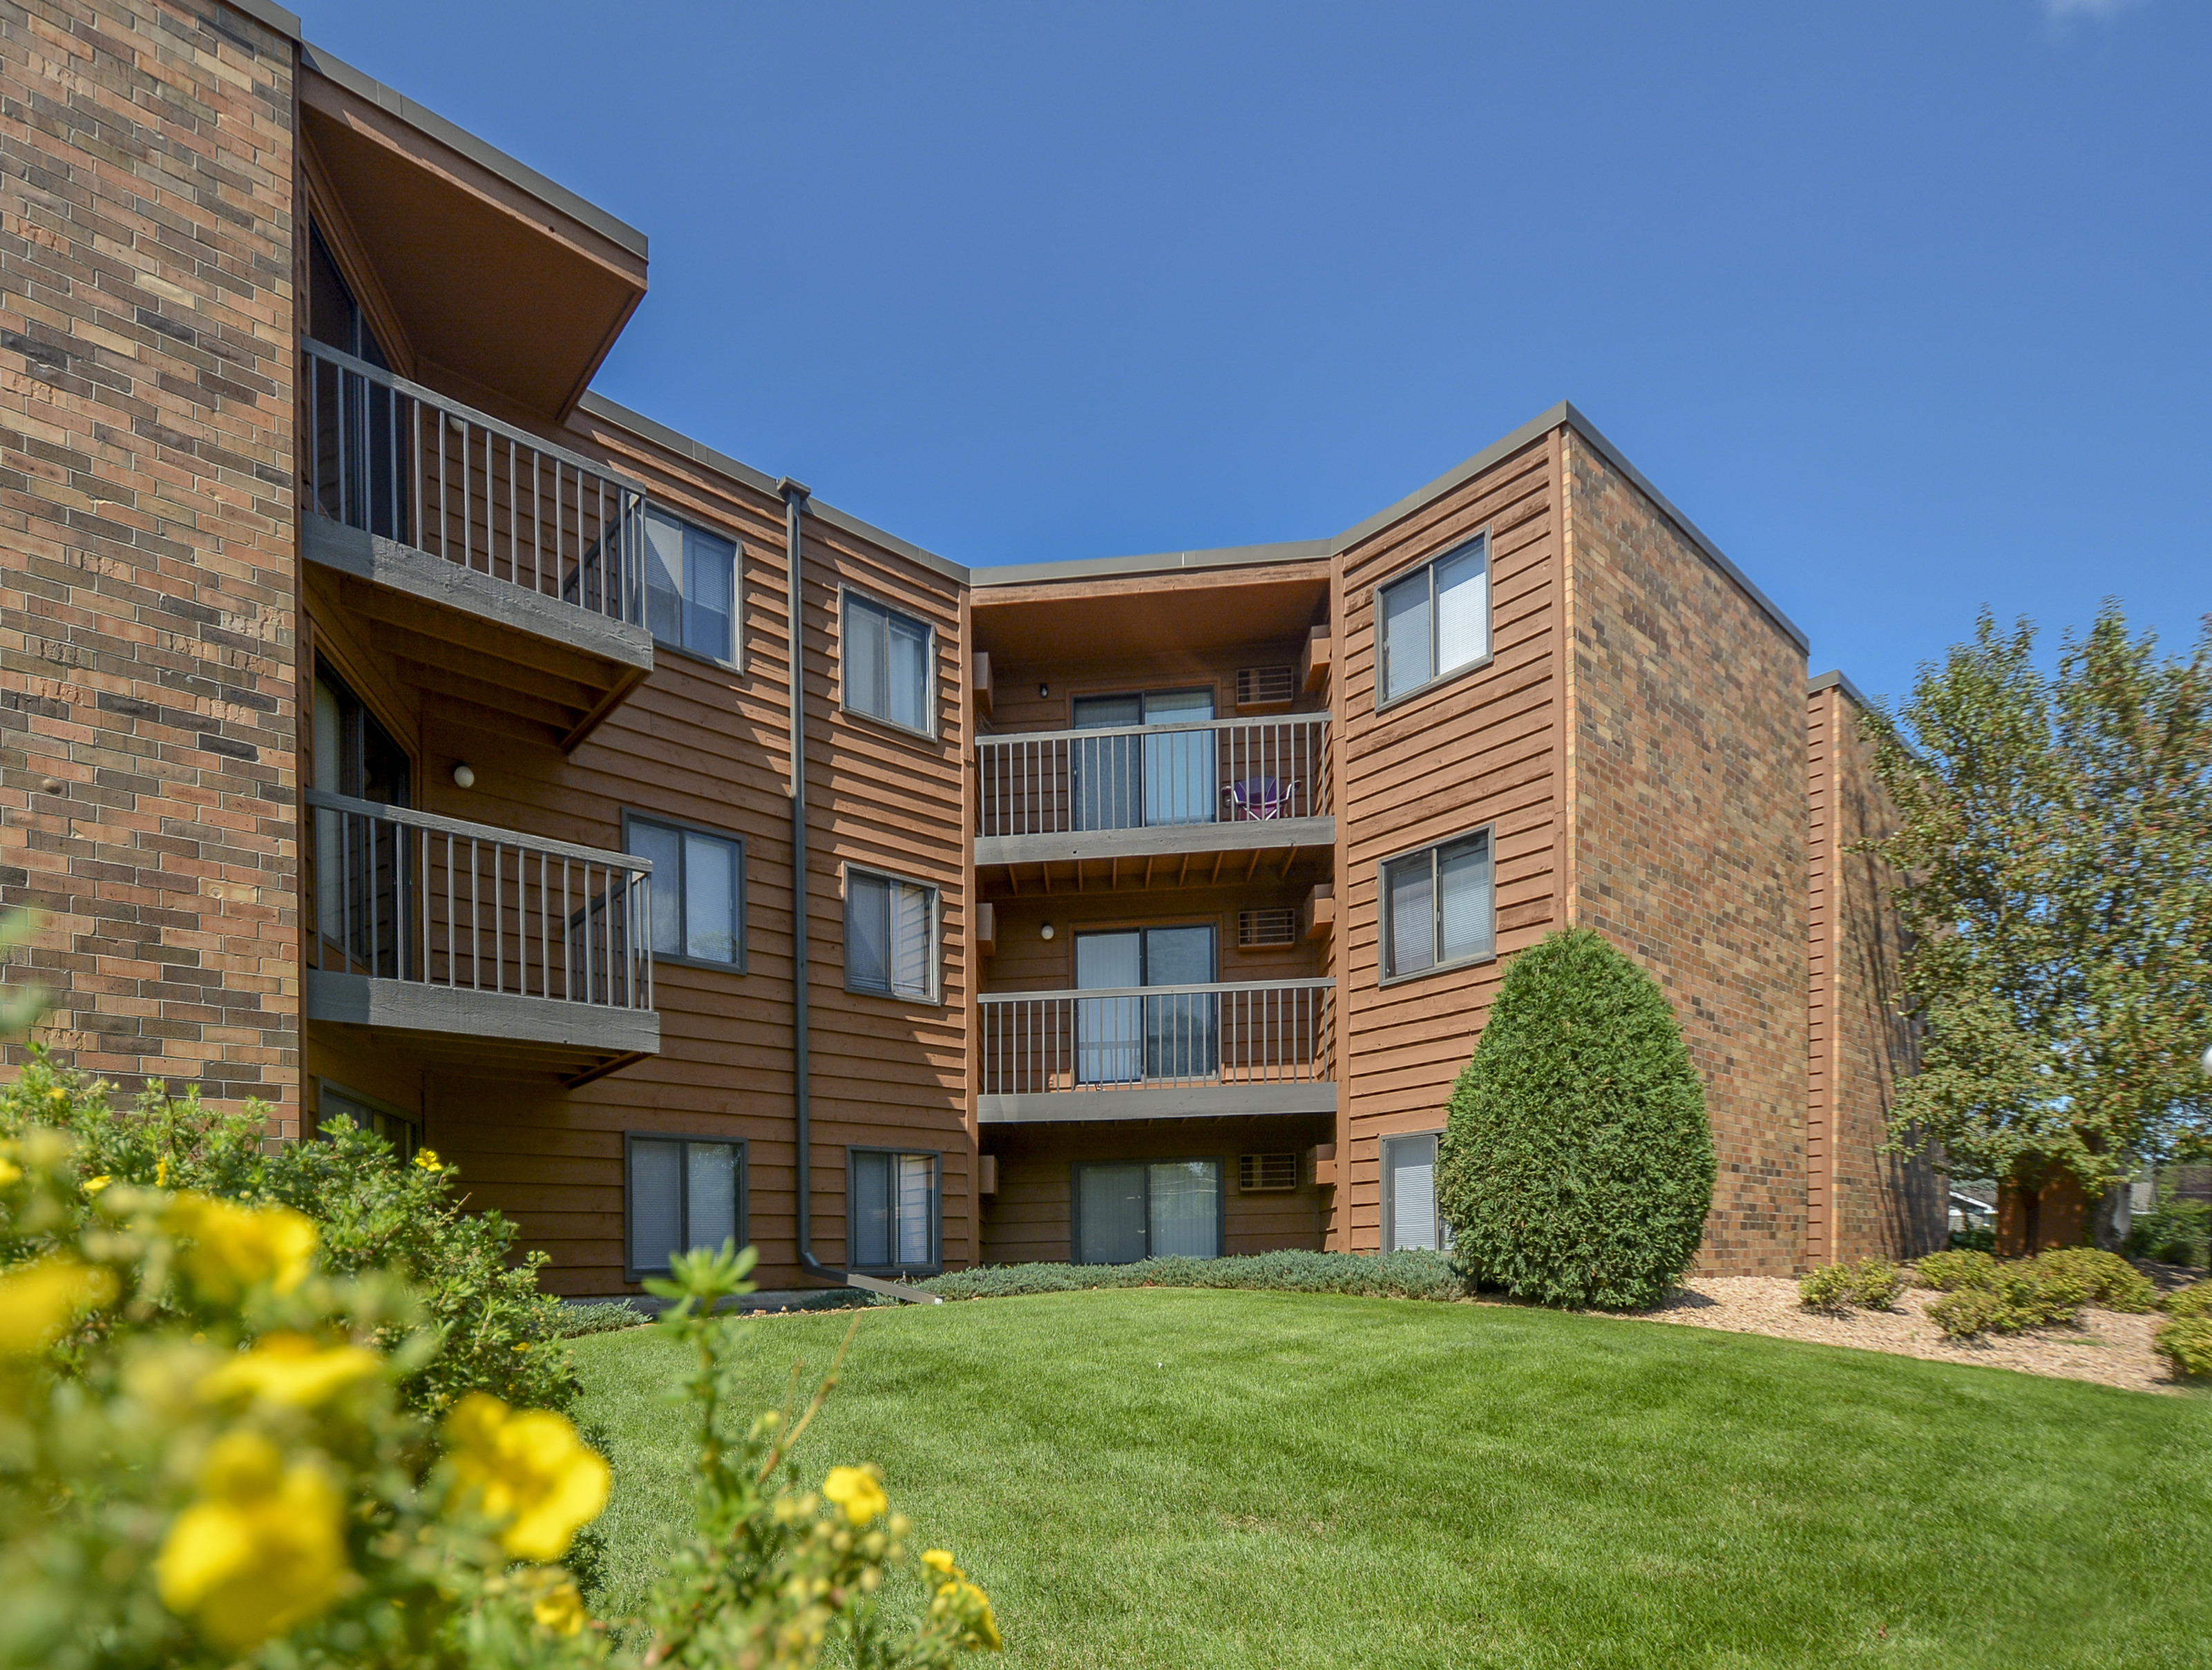 Garden Square Apartments